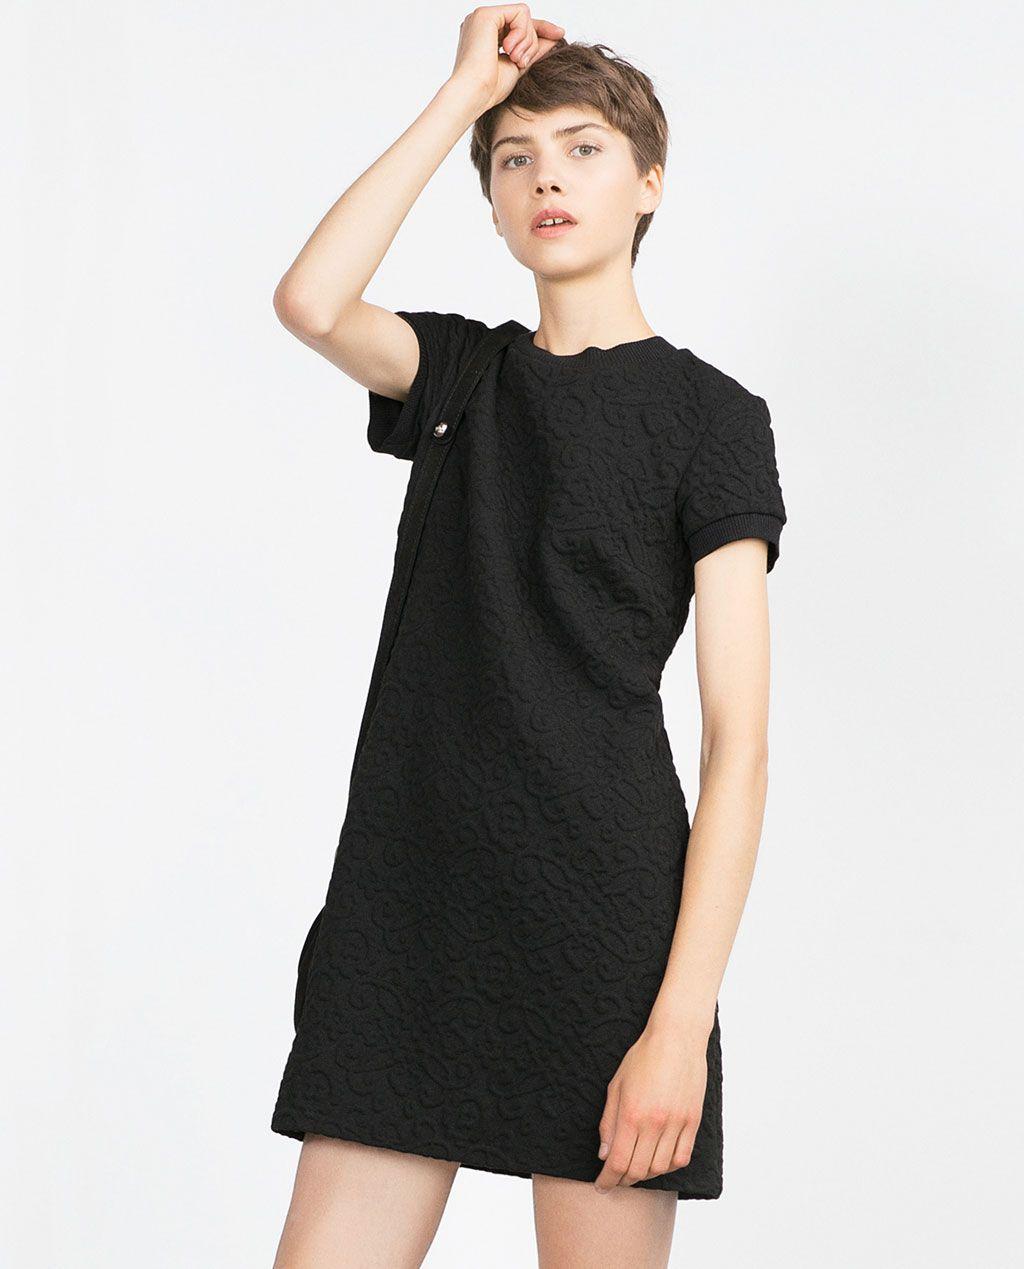 Zara, SS 2016